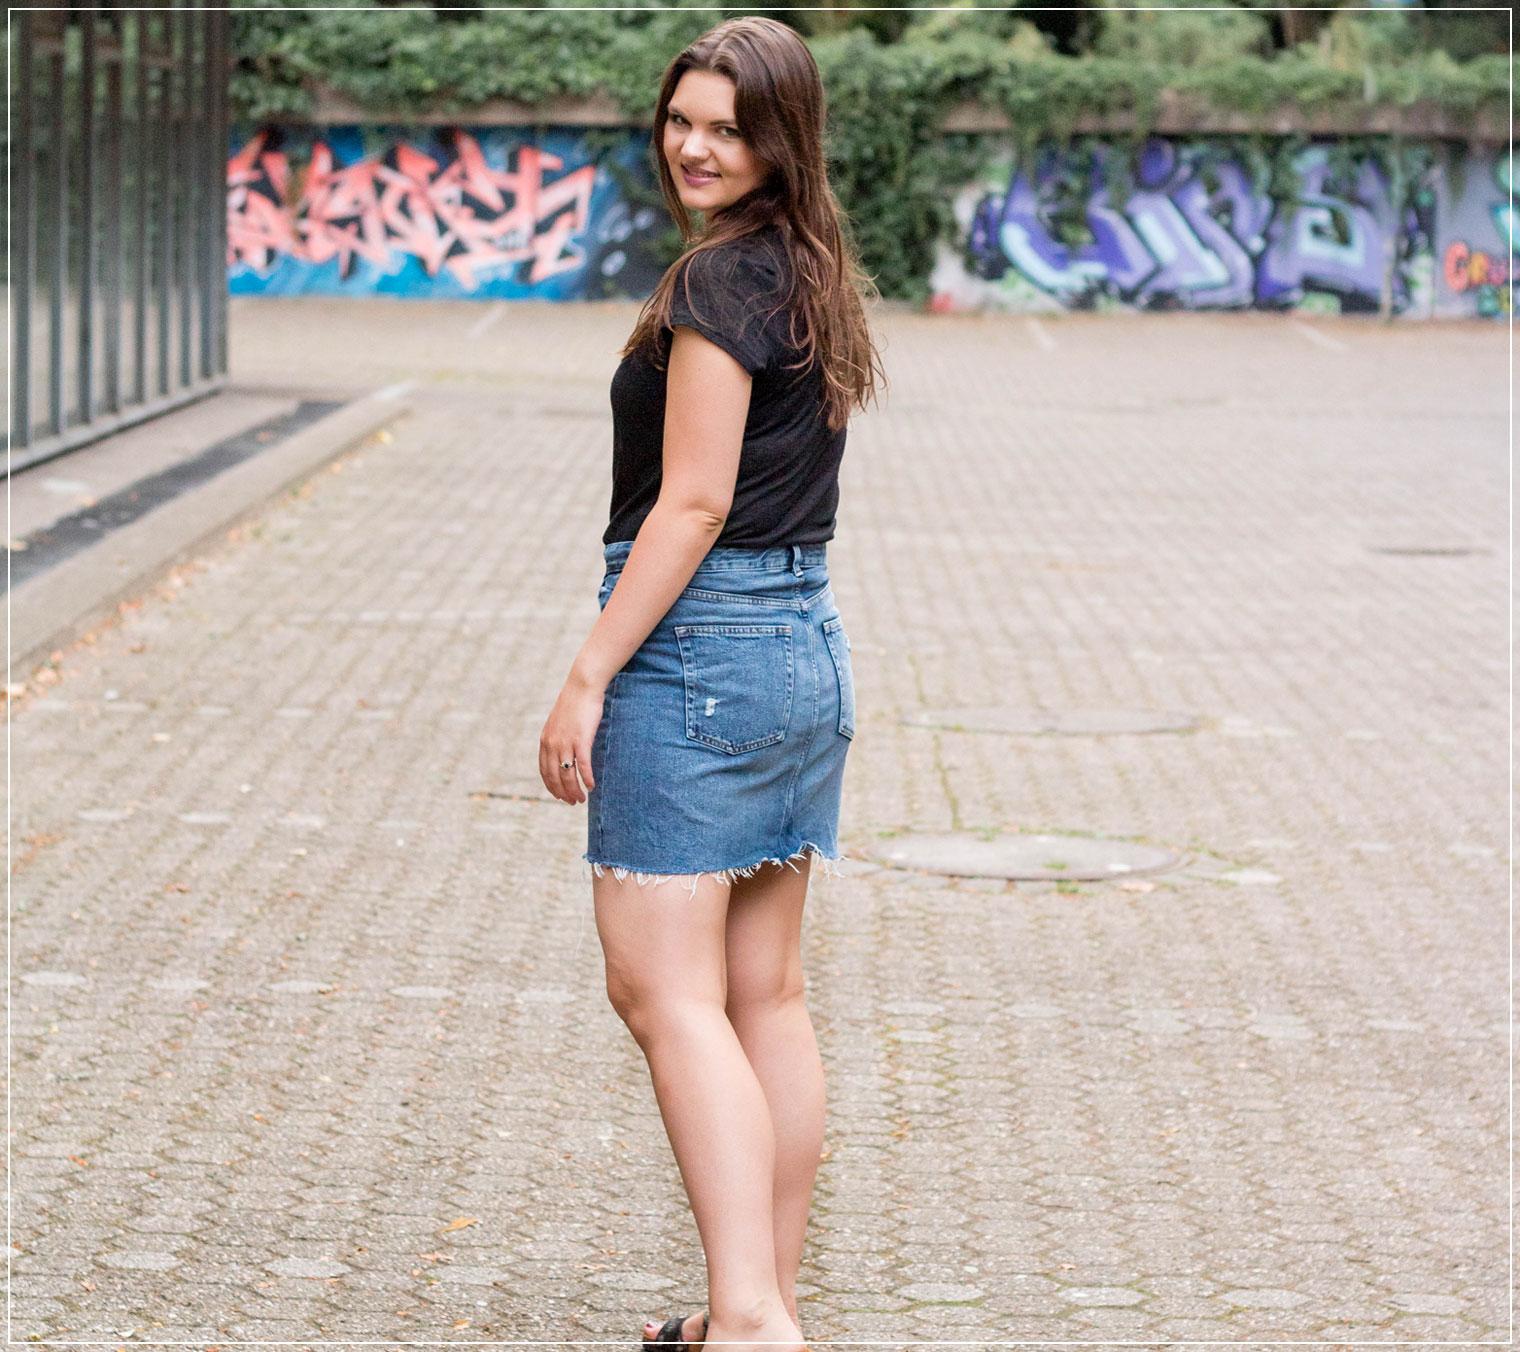 Sommer, Basics, Capsule Wardrobe, Sommeroutfit, Modetrends, Fashion, Modeblog, Ruhrgebiet, Bloggerin, Fashionblog